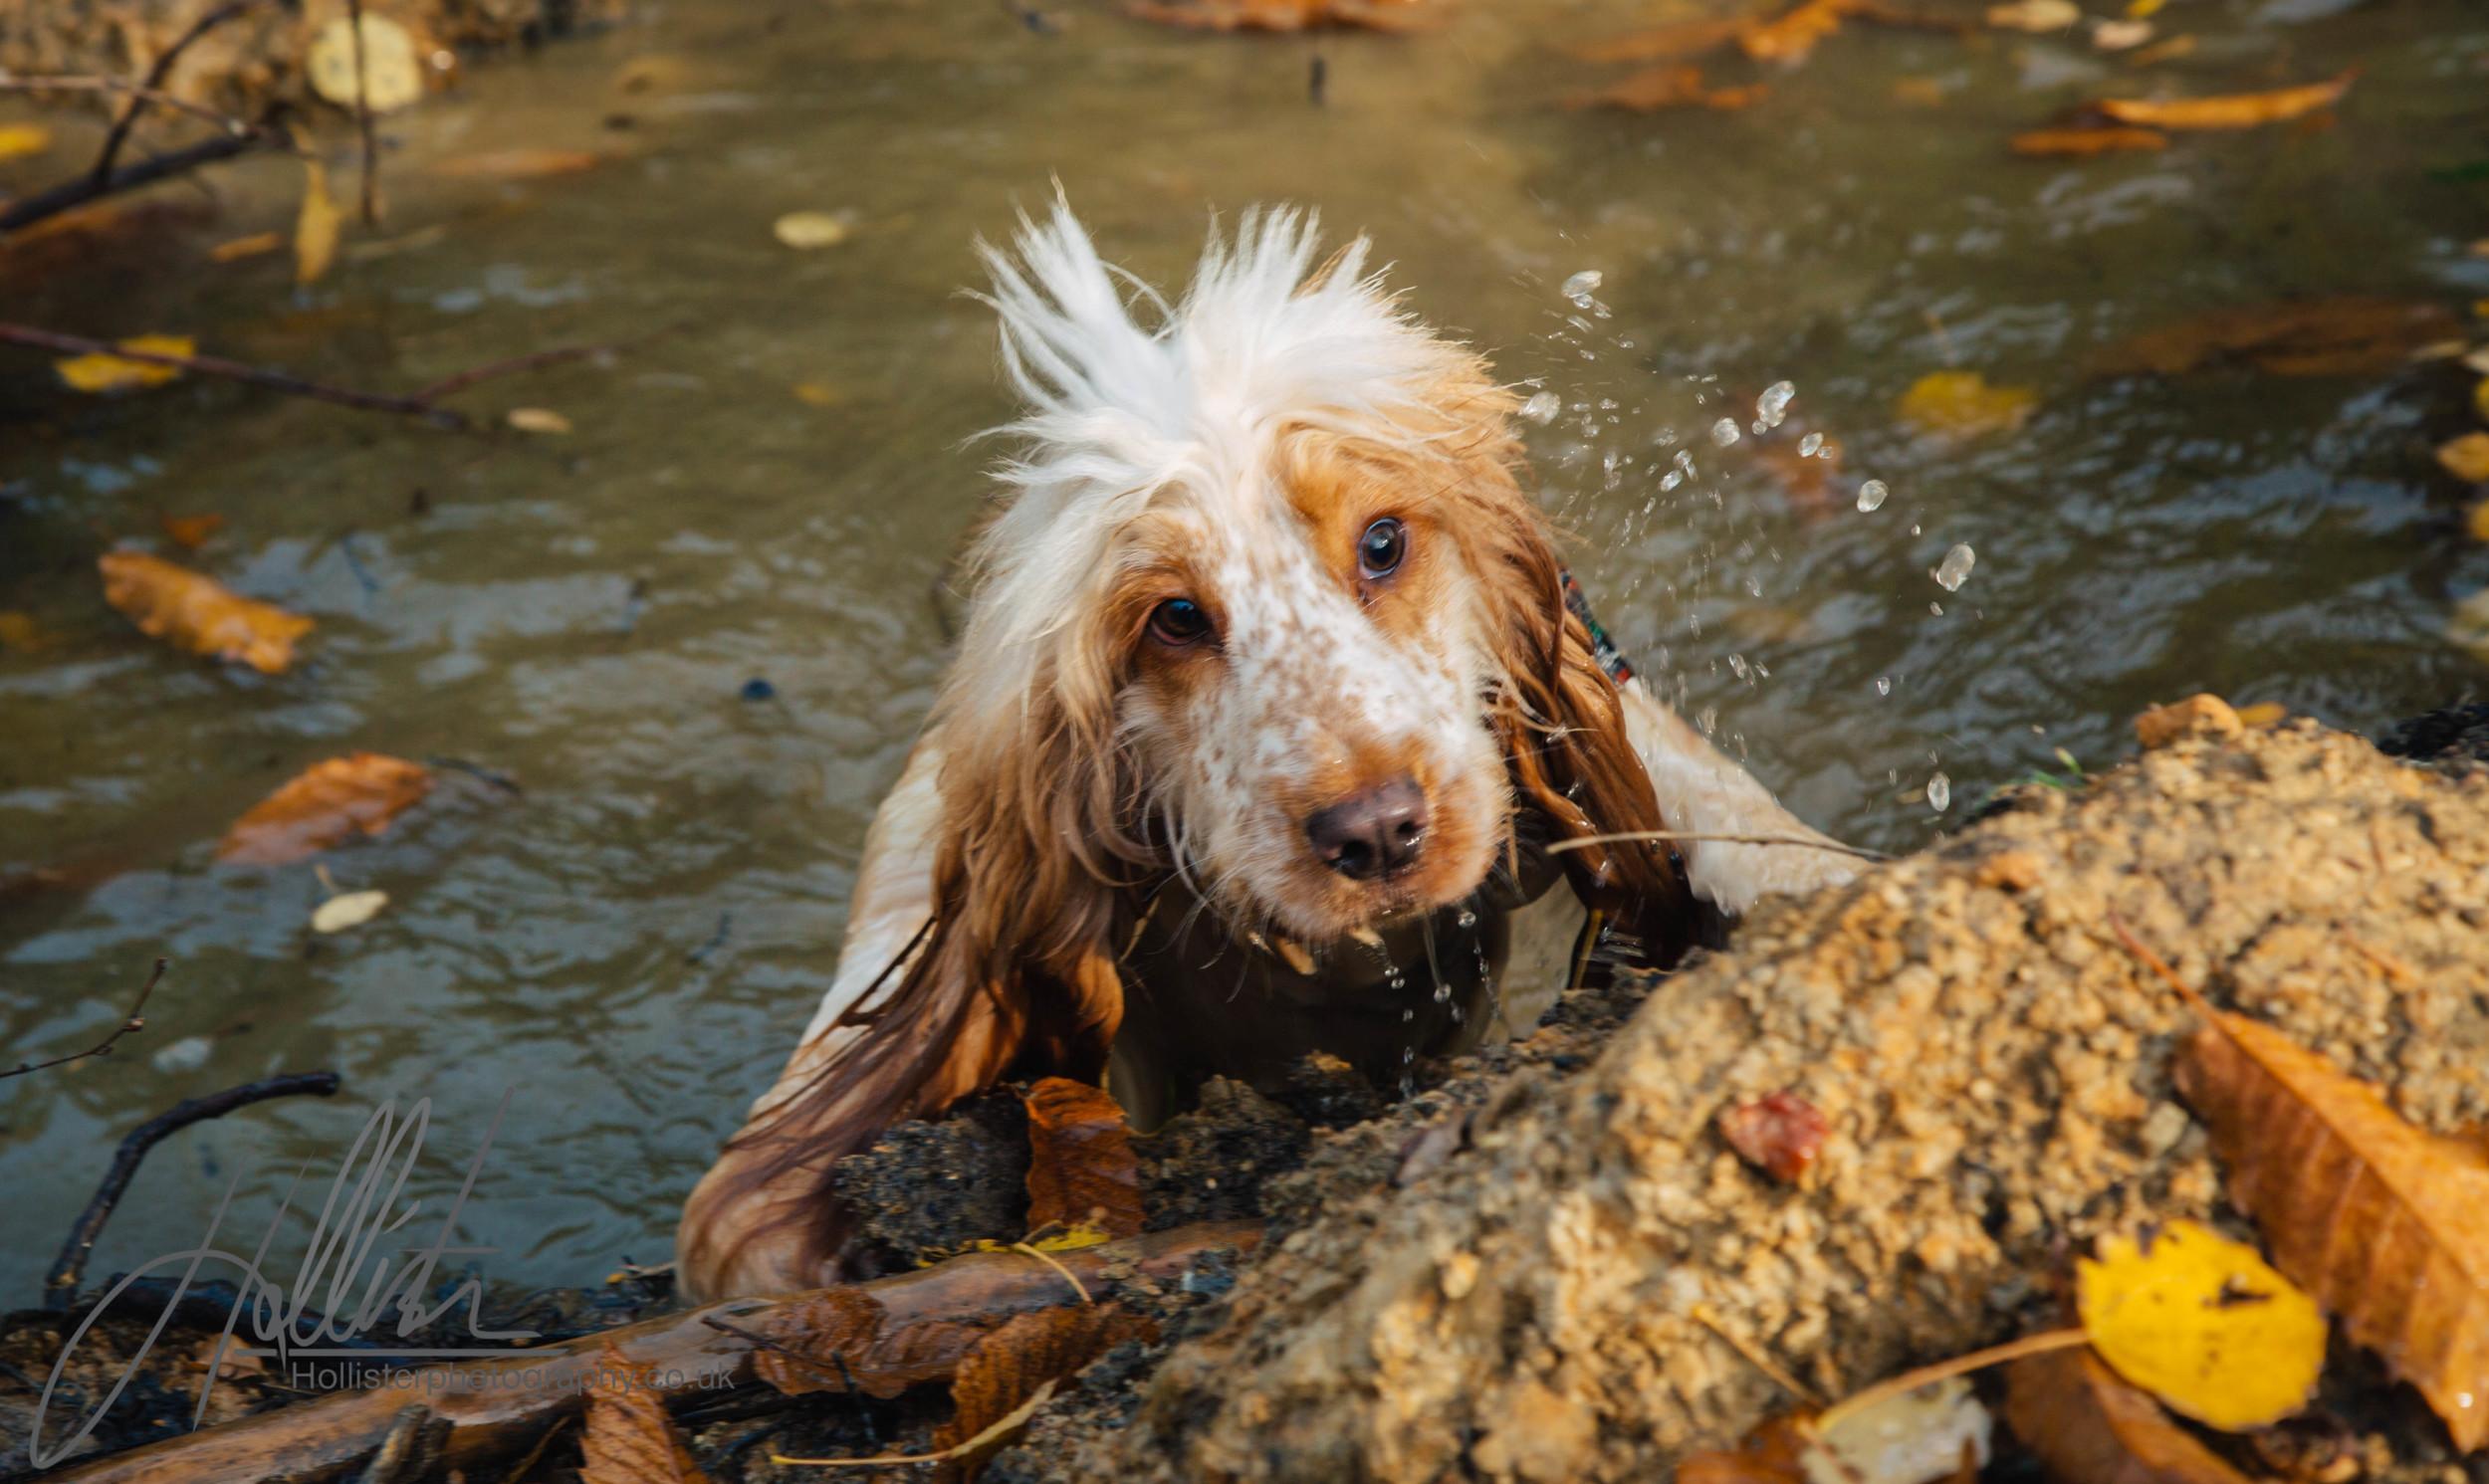 Hollisterphotography ABBY CLOWES WOOD DOG WALK-35.JPG